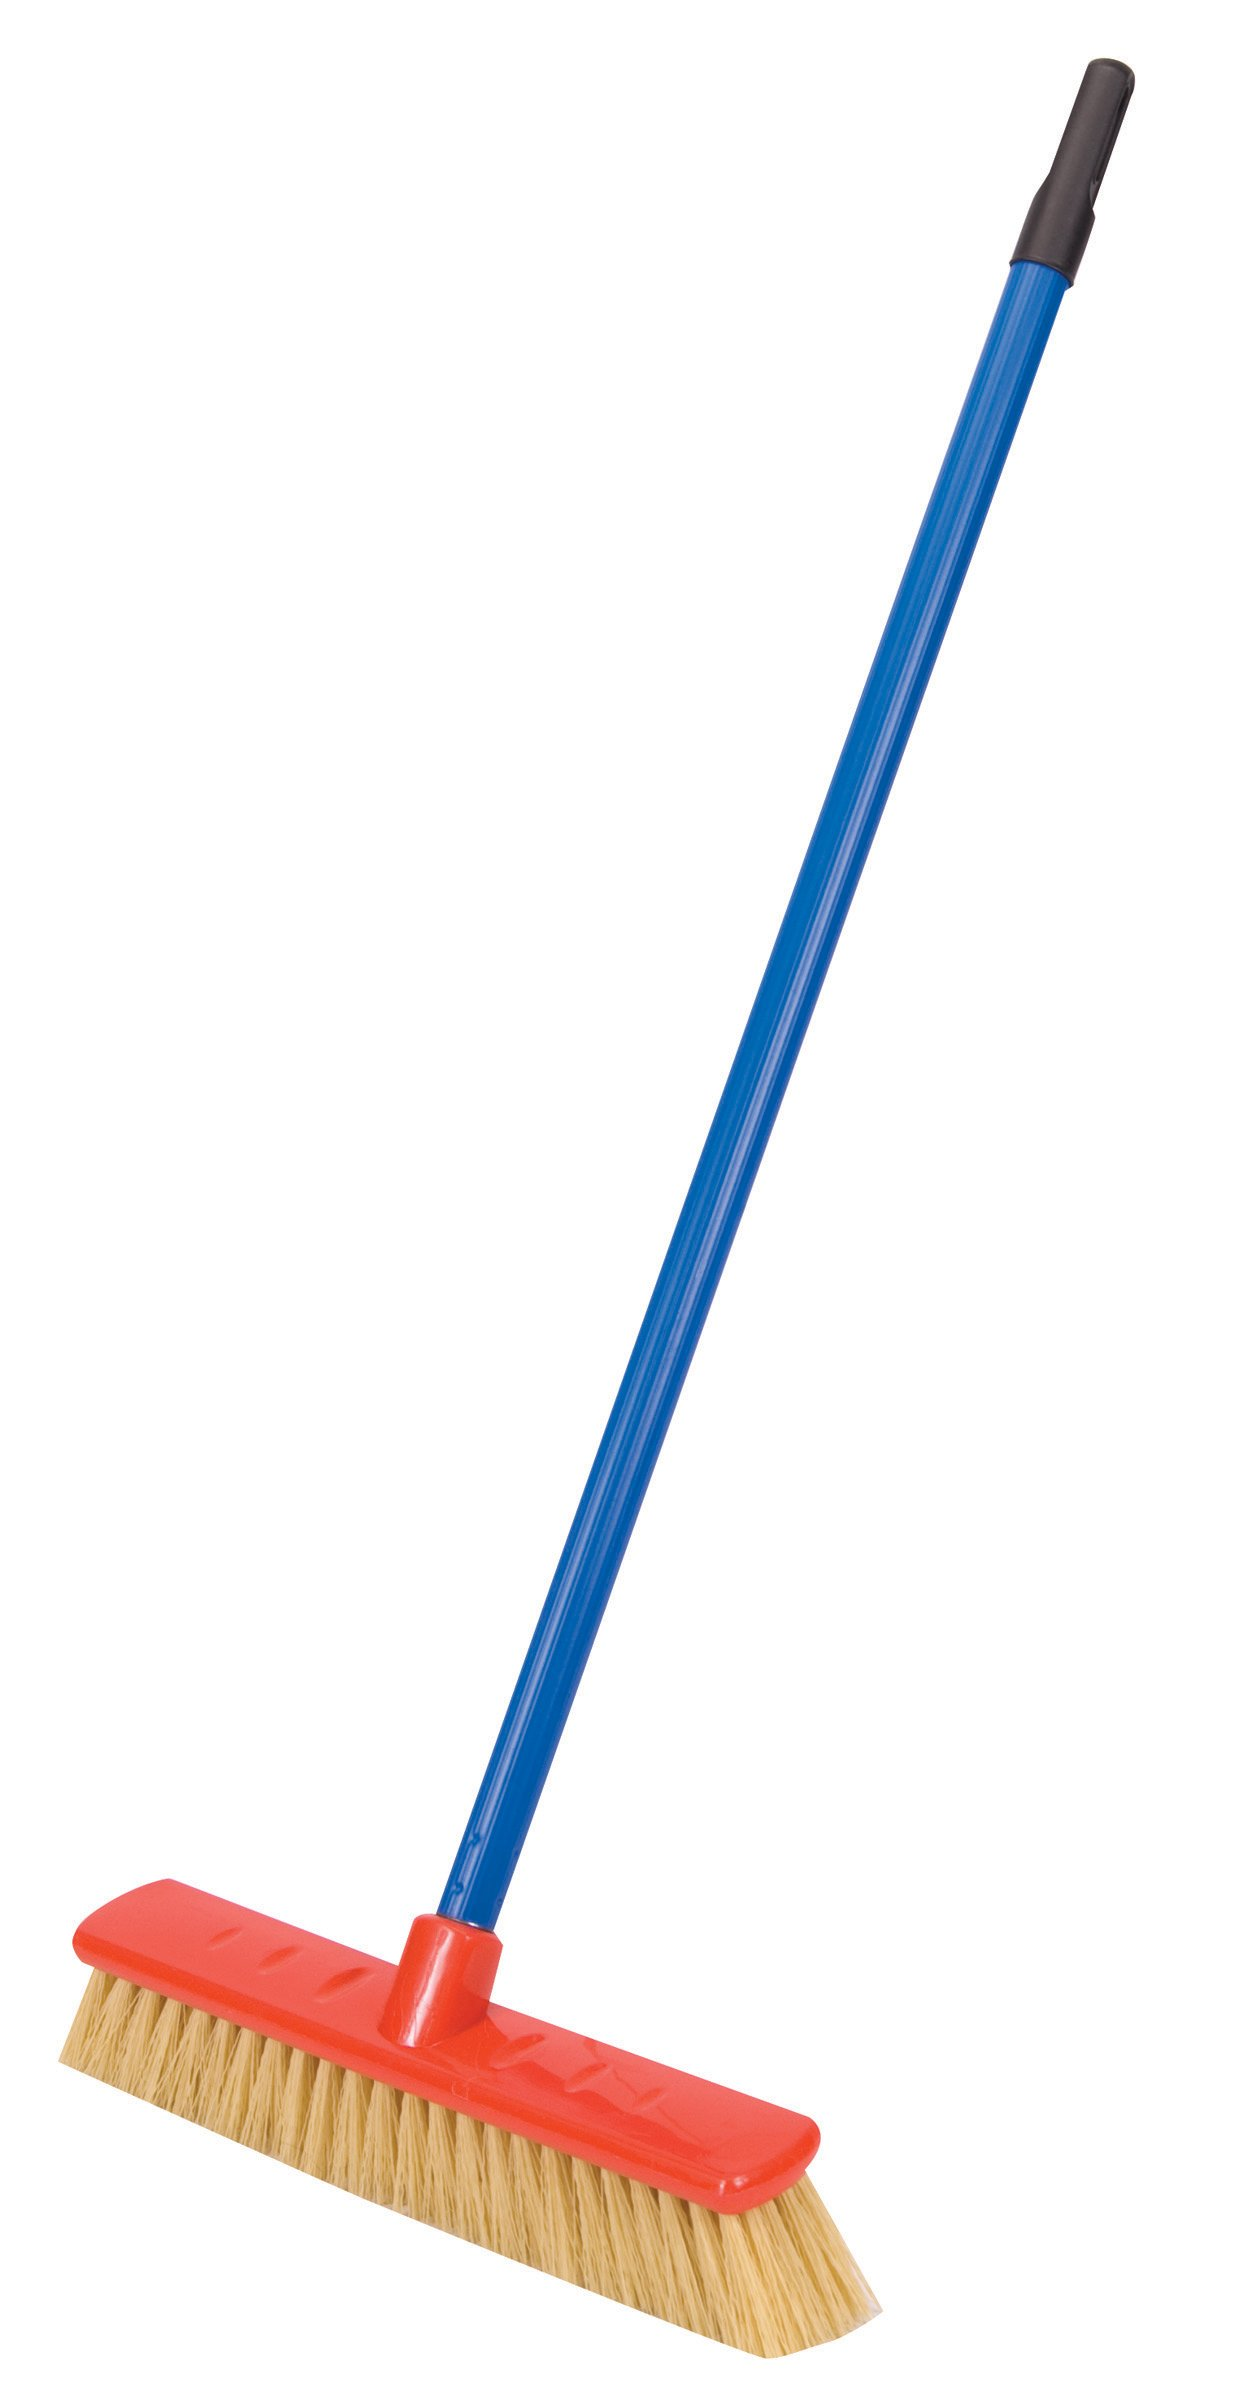 Schylling Junior Helper Push Broom by Schylling